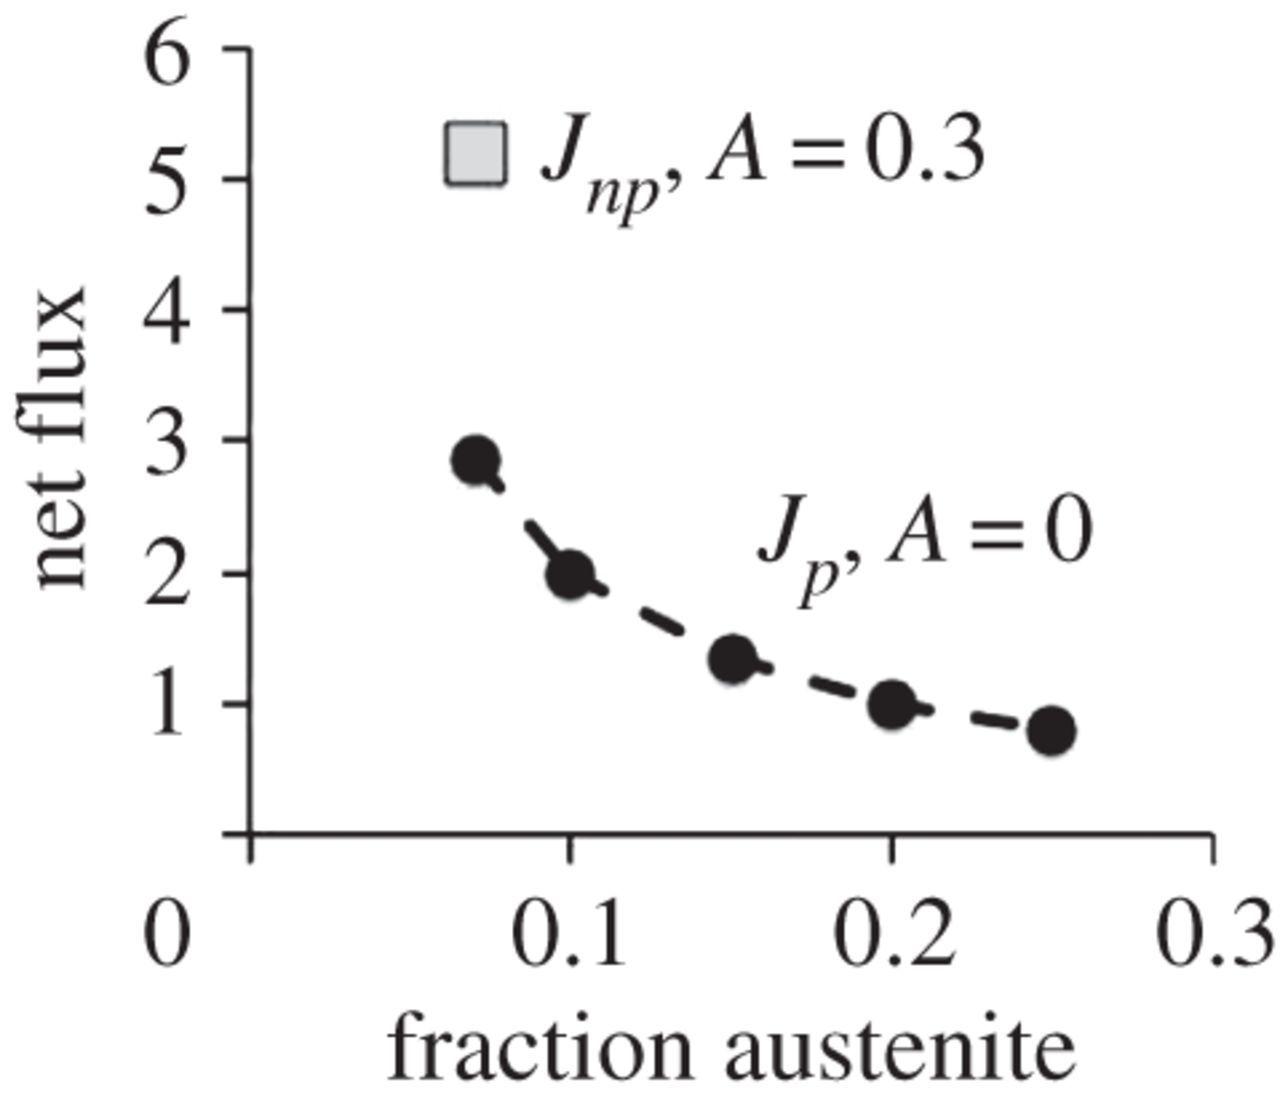 Hydrogen diffusion and the percolation of austenite in